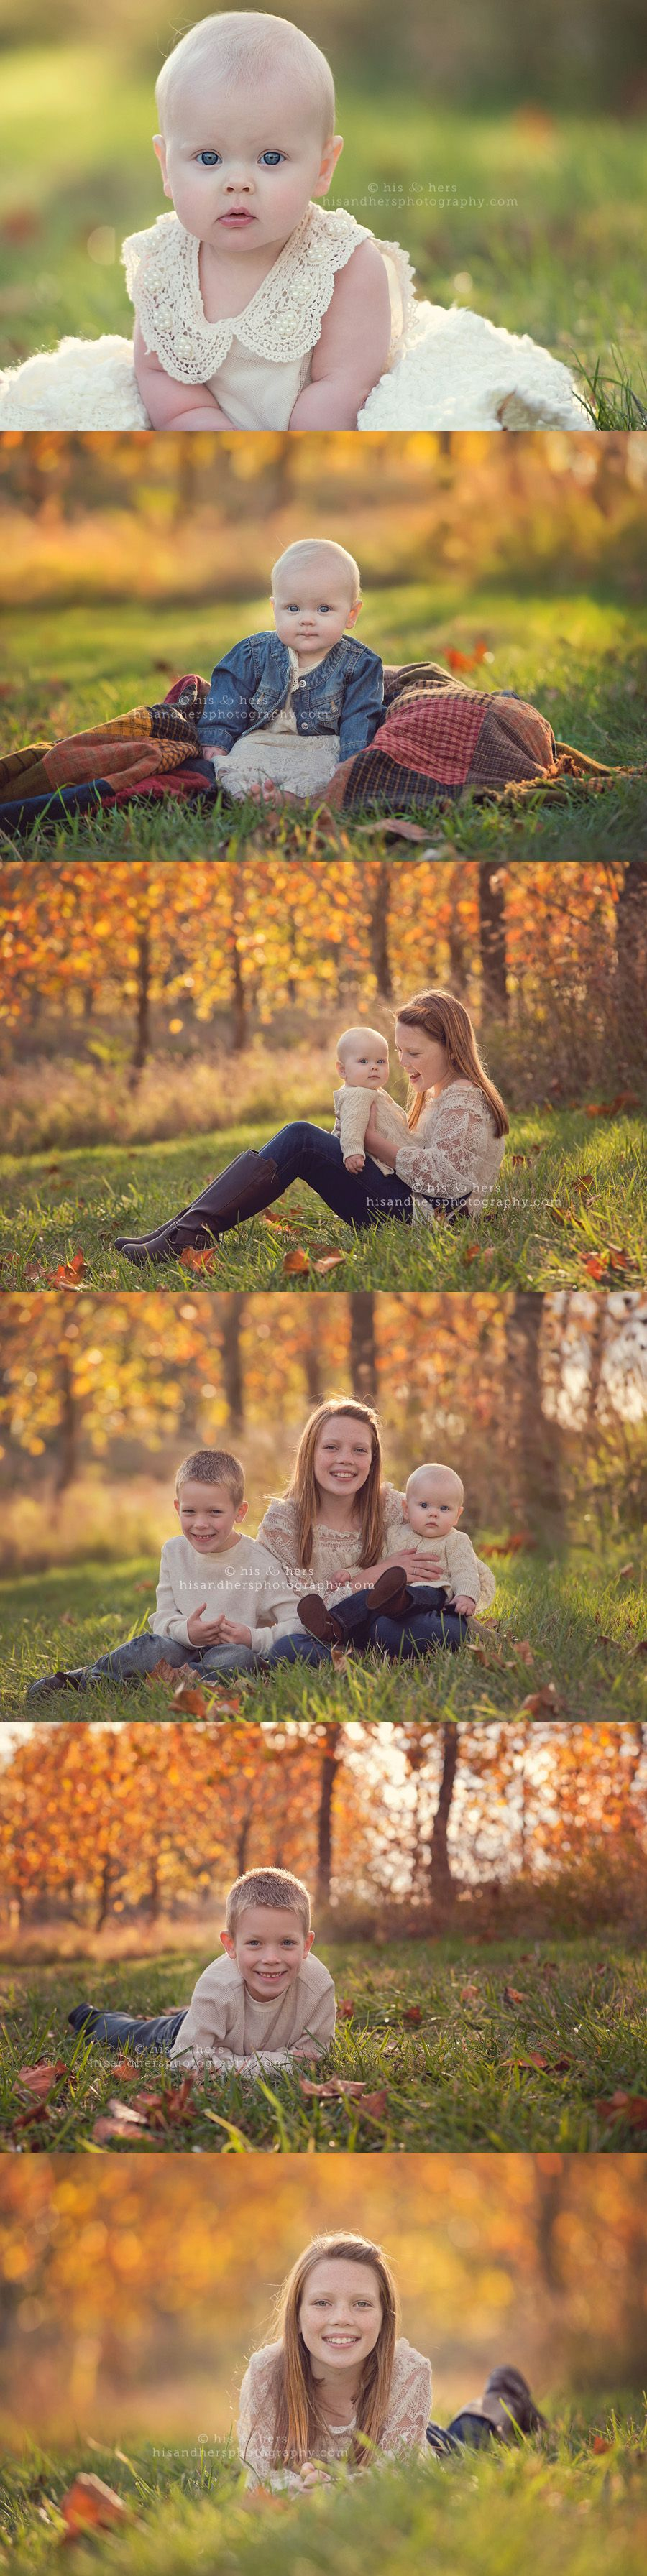 Baby + Sibling | Khloe, 6 months, Molly 9, Ryan 5